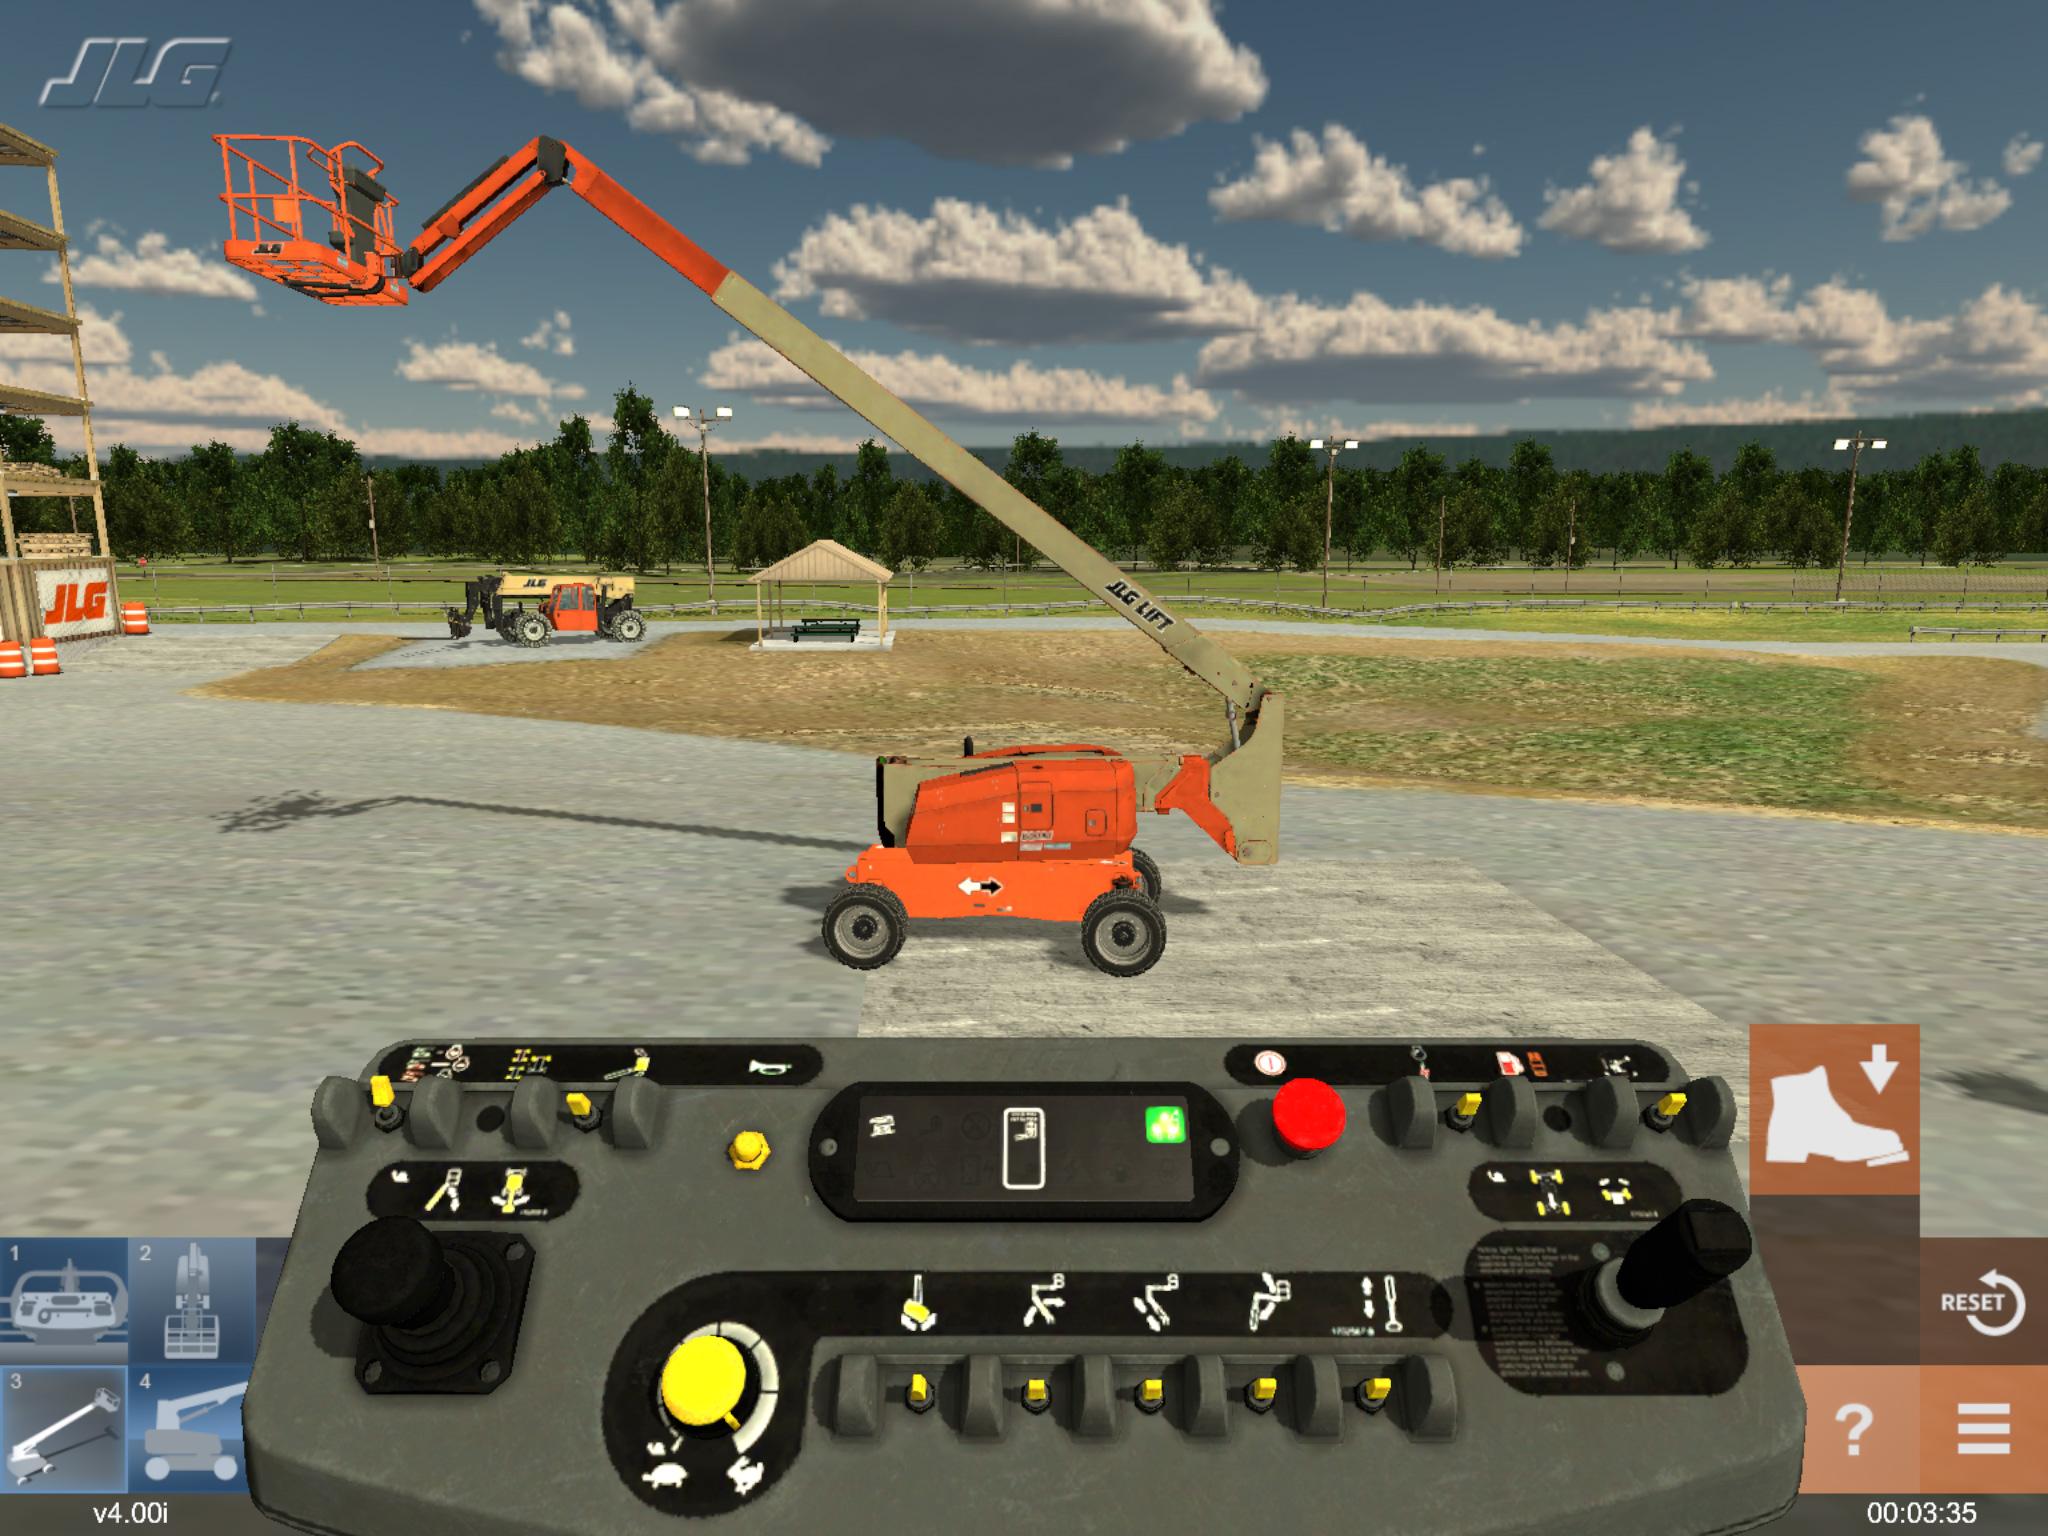 JLG Heavy Equipment Operator Training Simulator